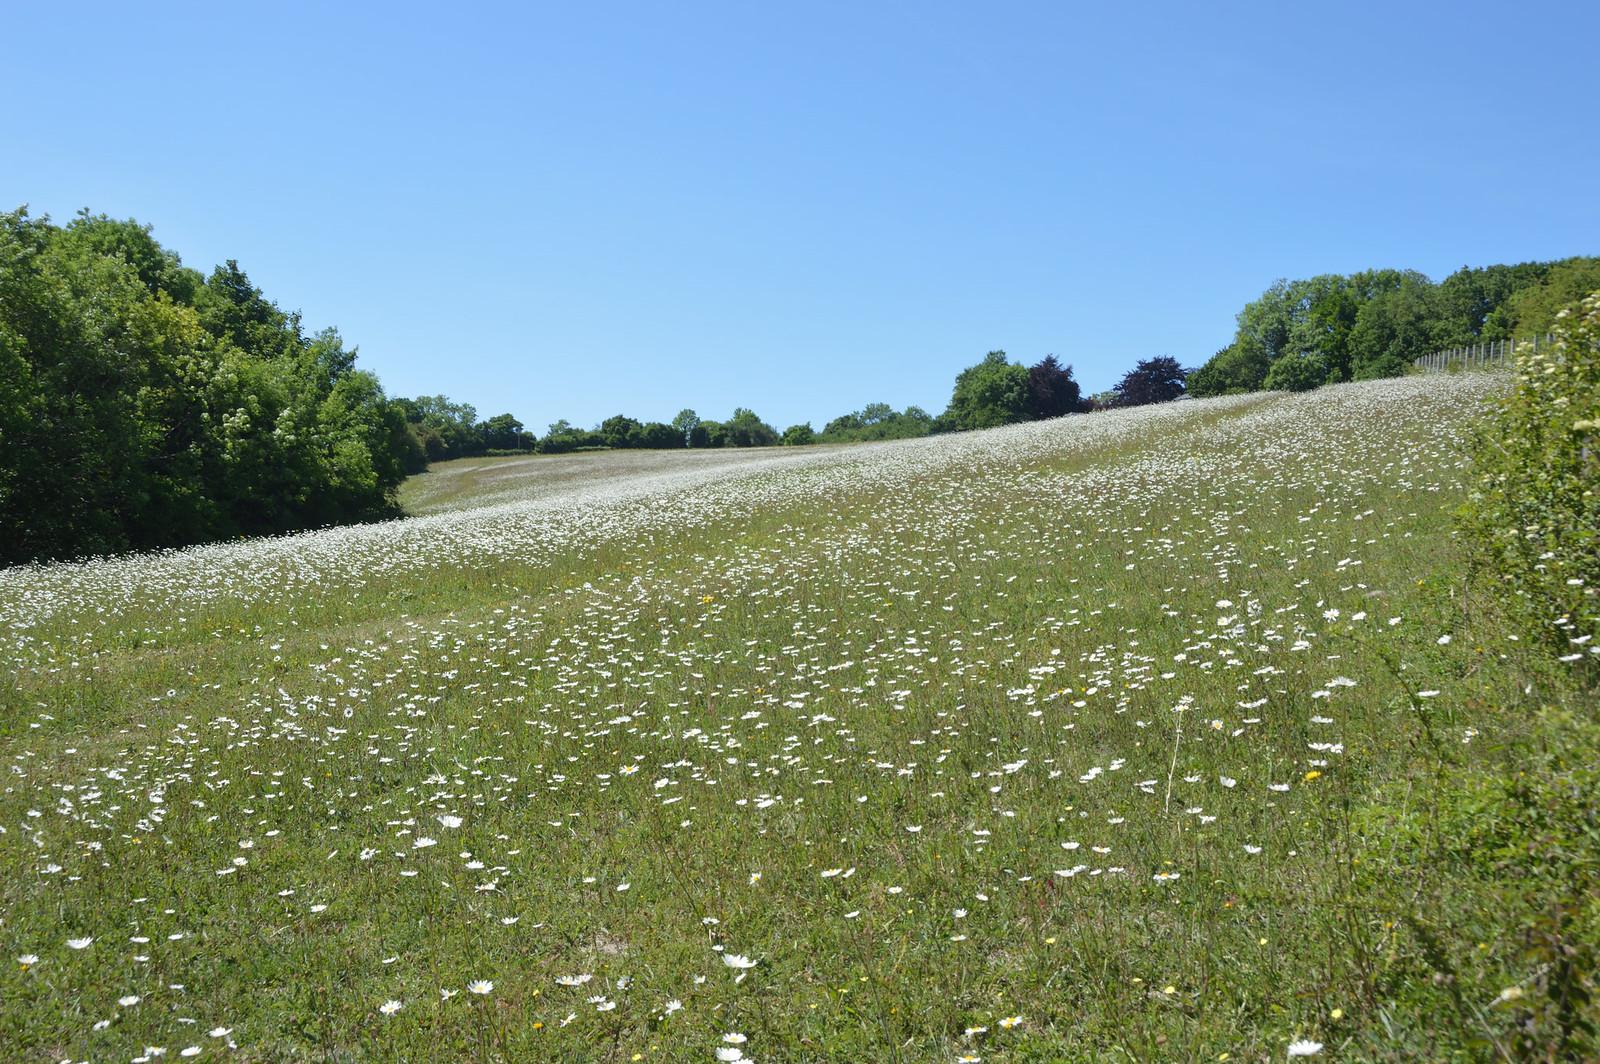 Shoreham Dalhanna field of Oxeye daisies